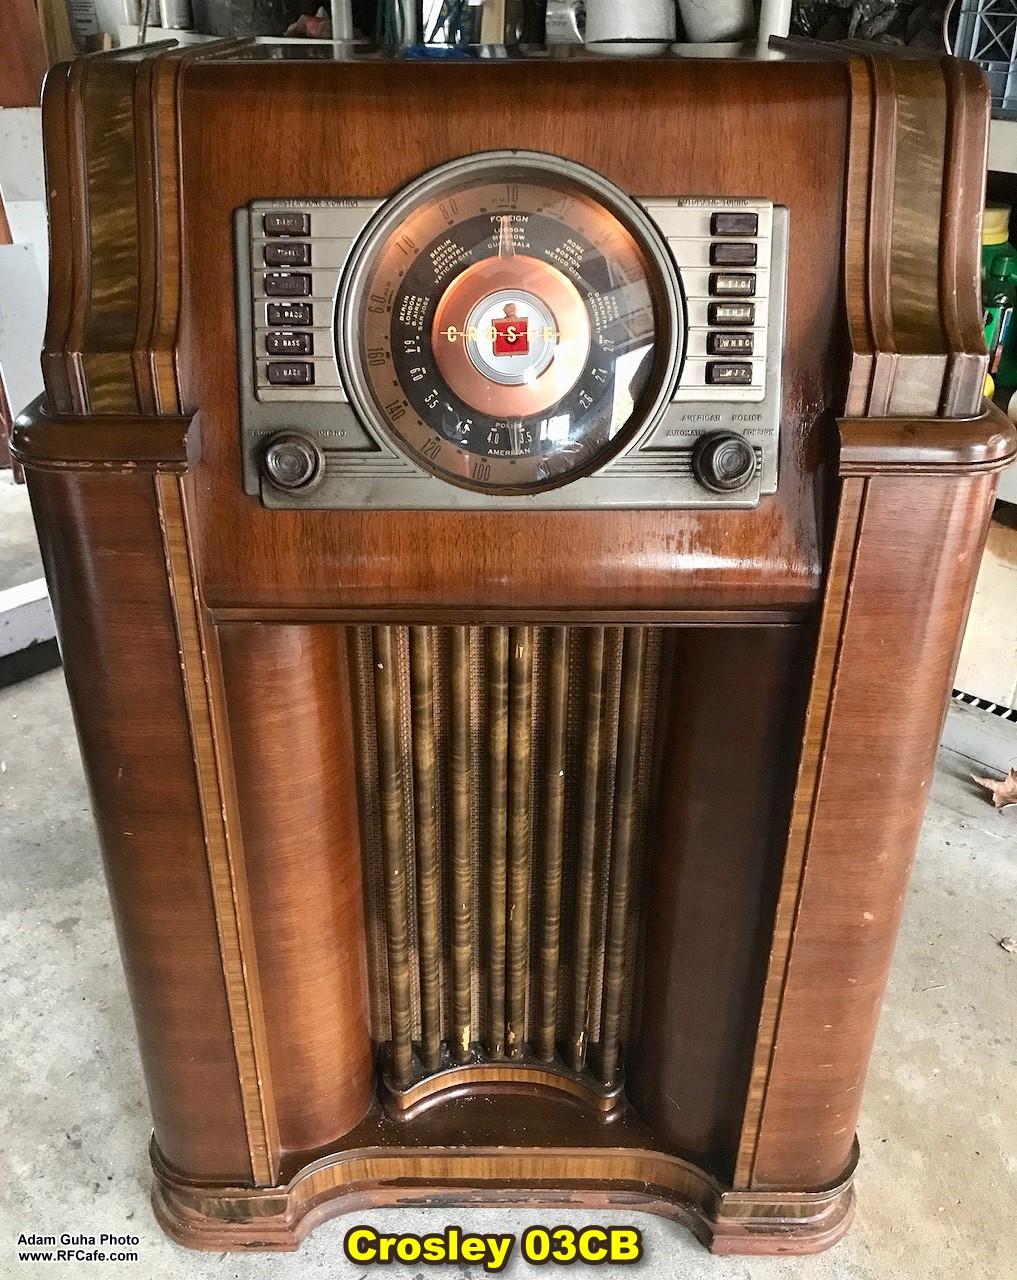 crosley 03cb floor console radio by adam guha